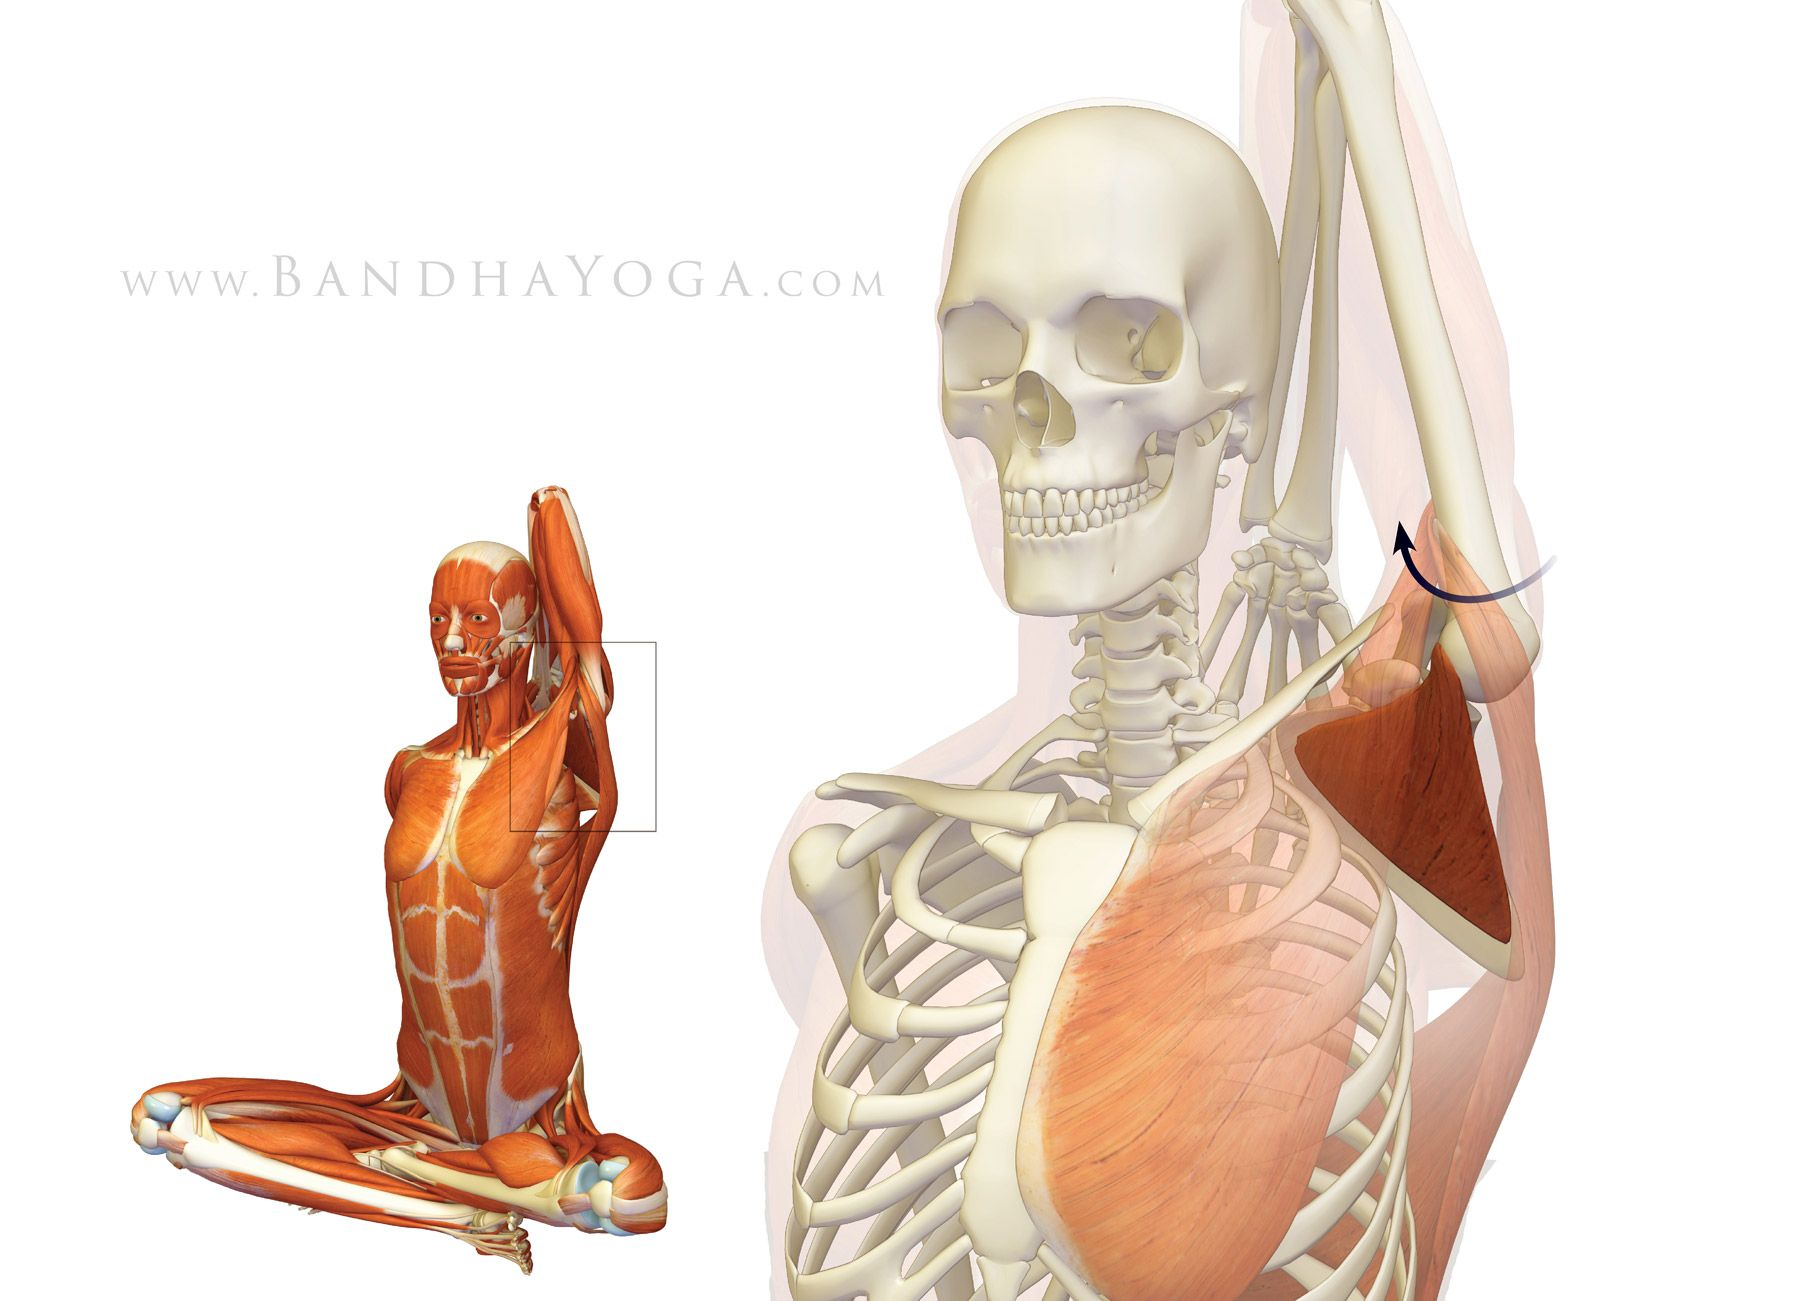 The Daily Bandha: Shoulder Biomechanics, Part I: The Subscapularis ...